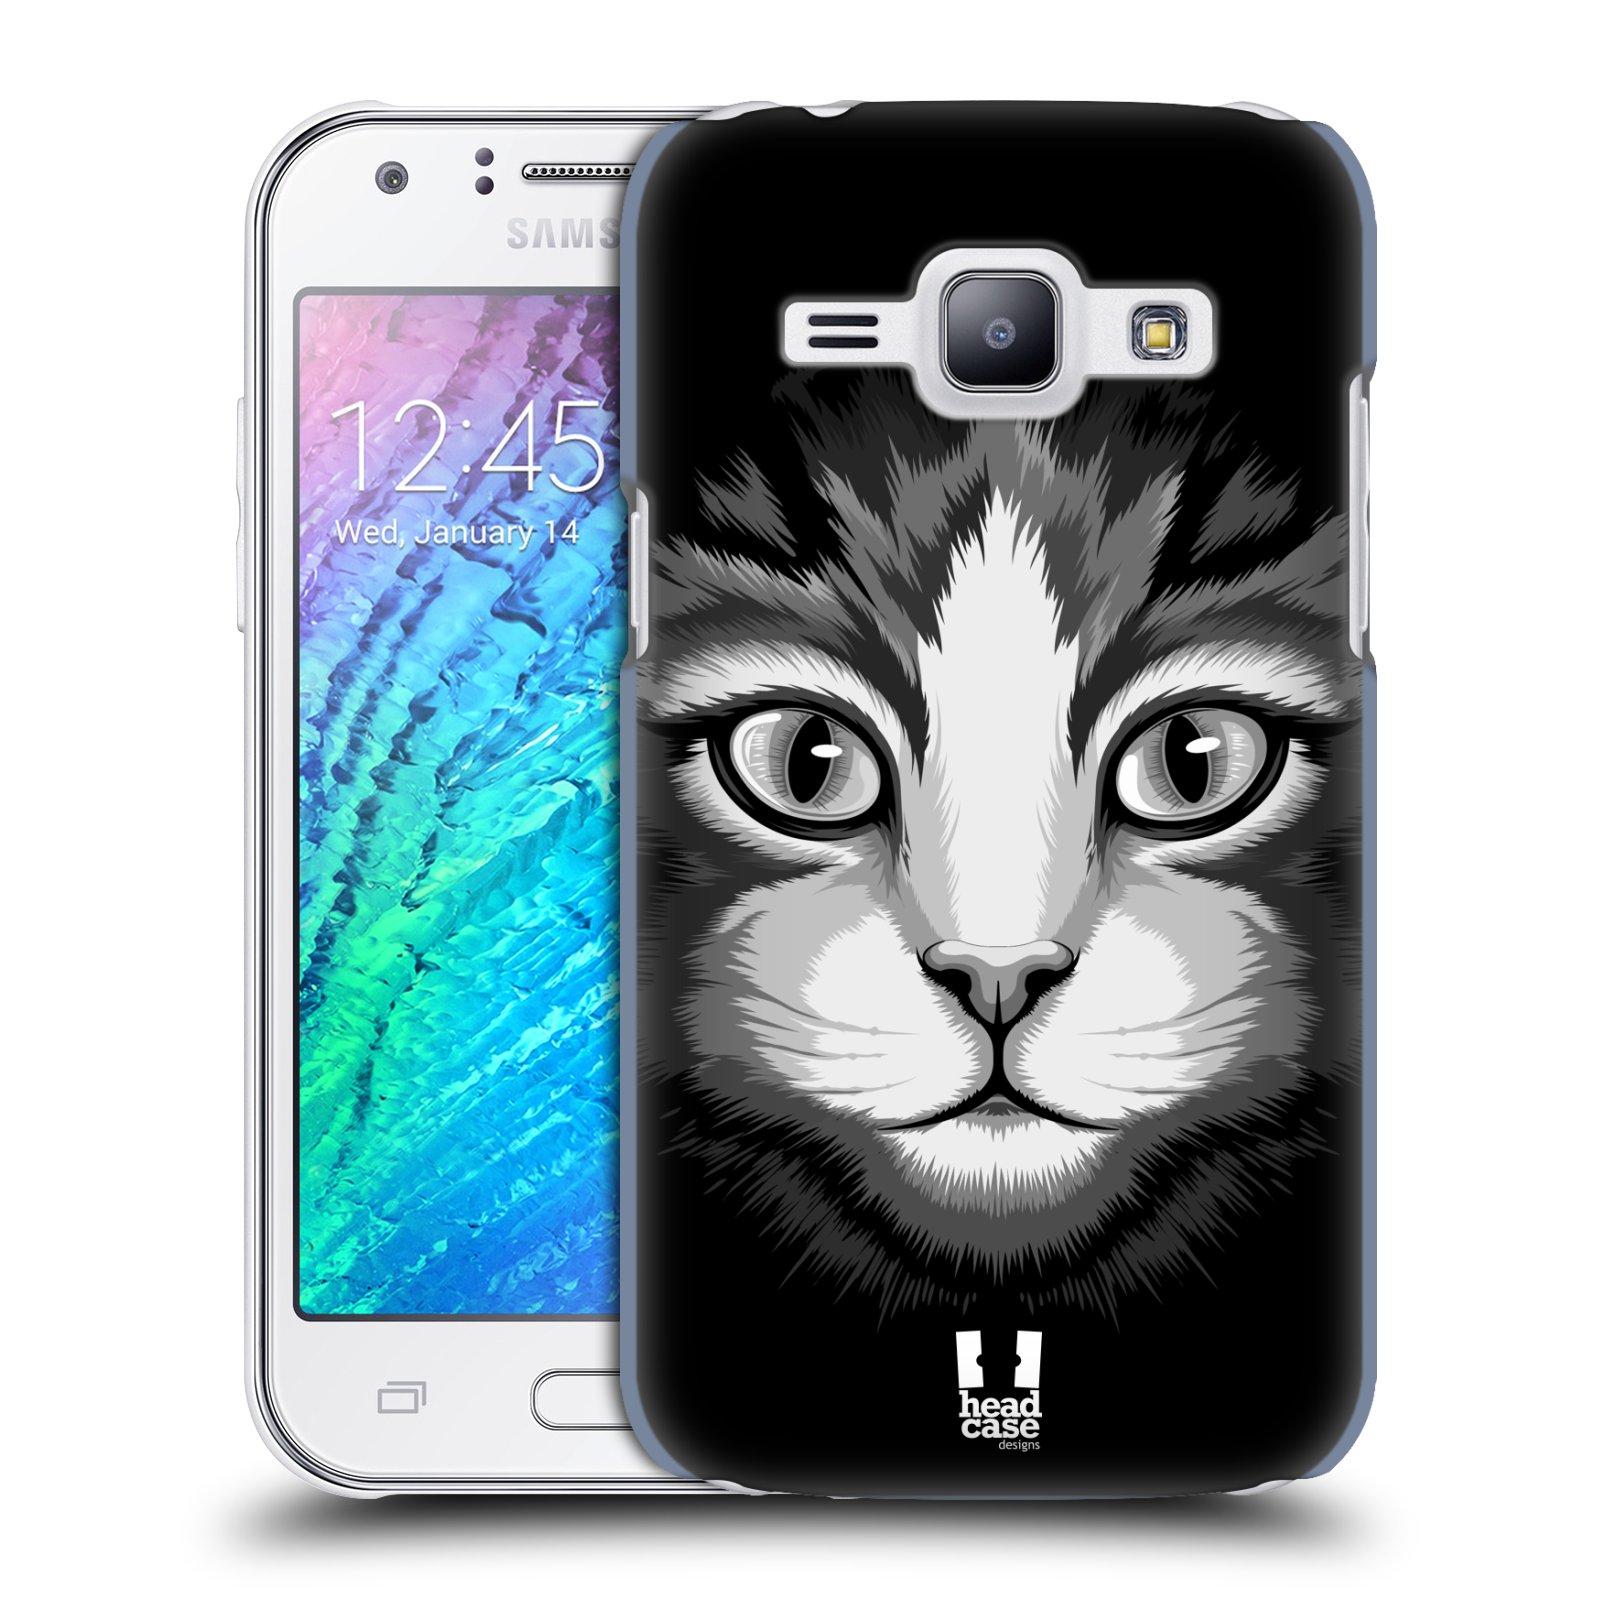 HEAD CASE plastový obal na mobil SAMSUNG Galaxy J1, J100 vzor Zvíře kreslená tvář 2 kočička